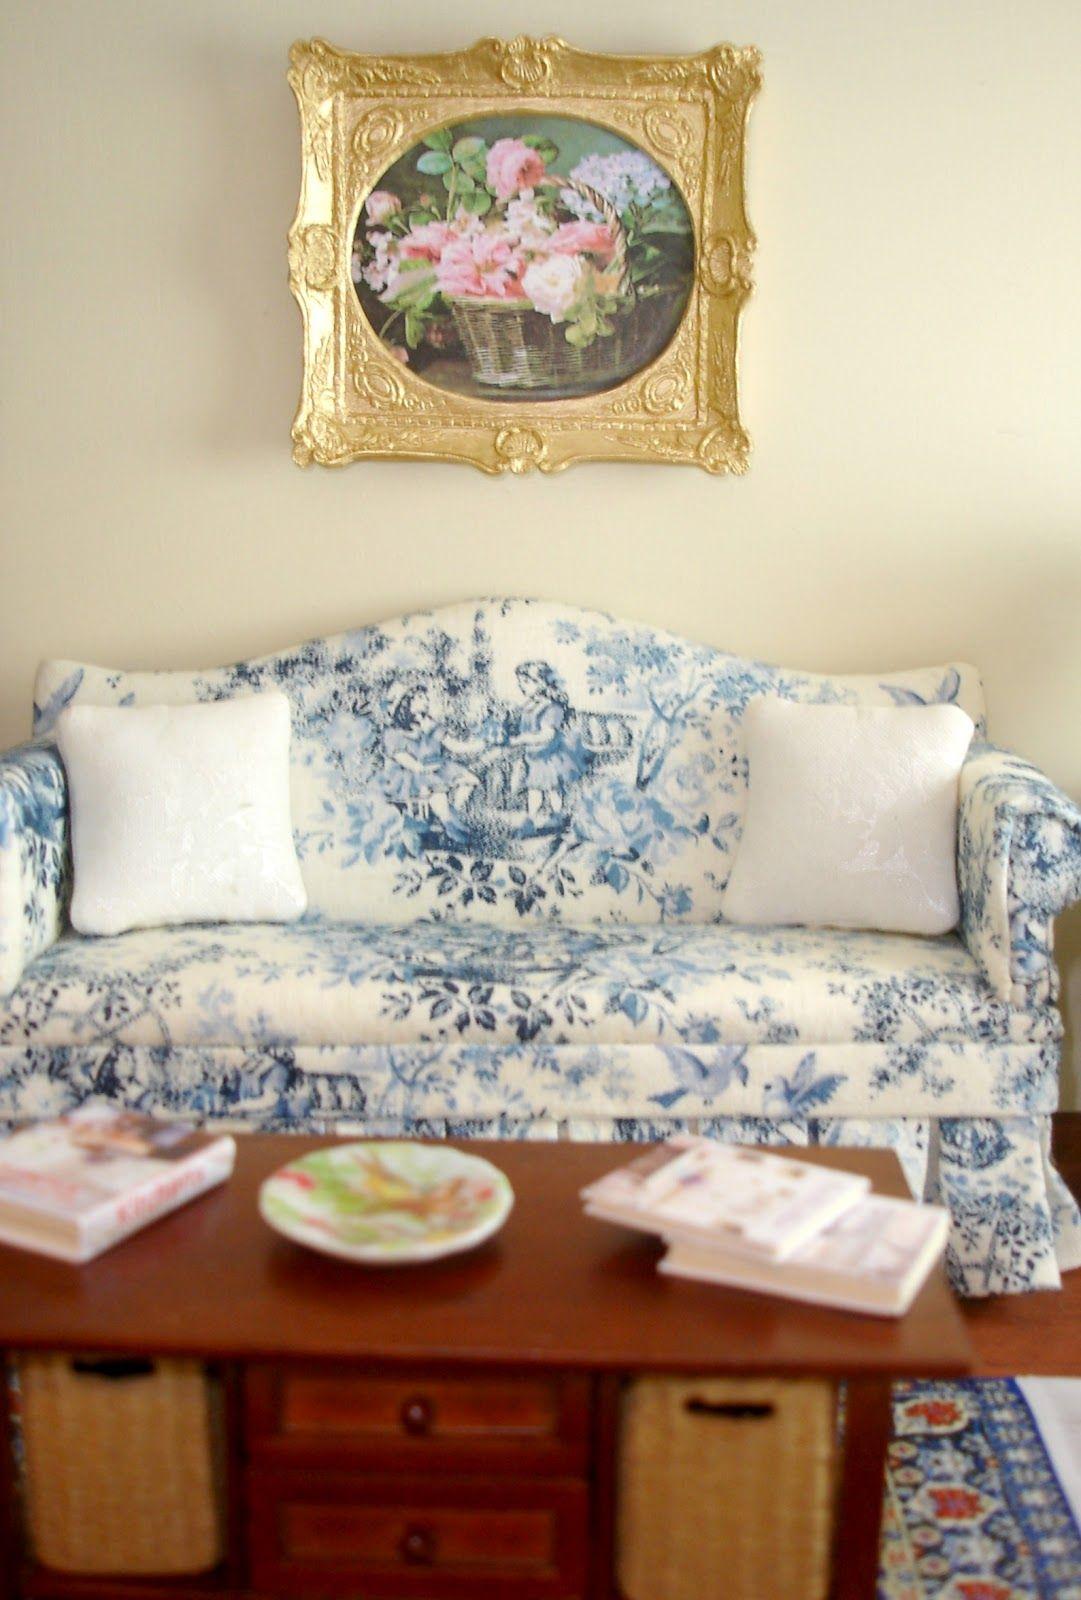 Peach Blossom Hill Toile de Jouy   Life in Miniature   Pinterest ...